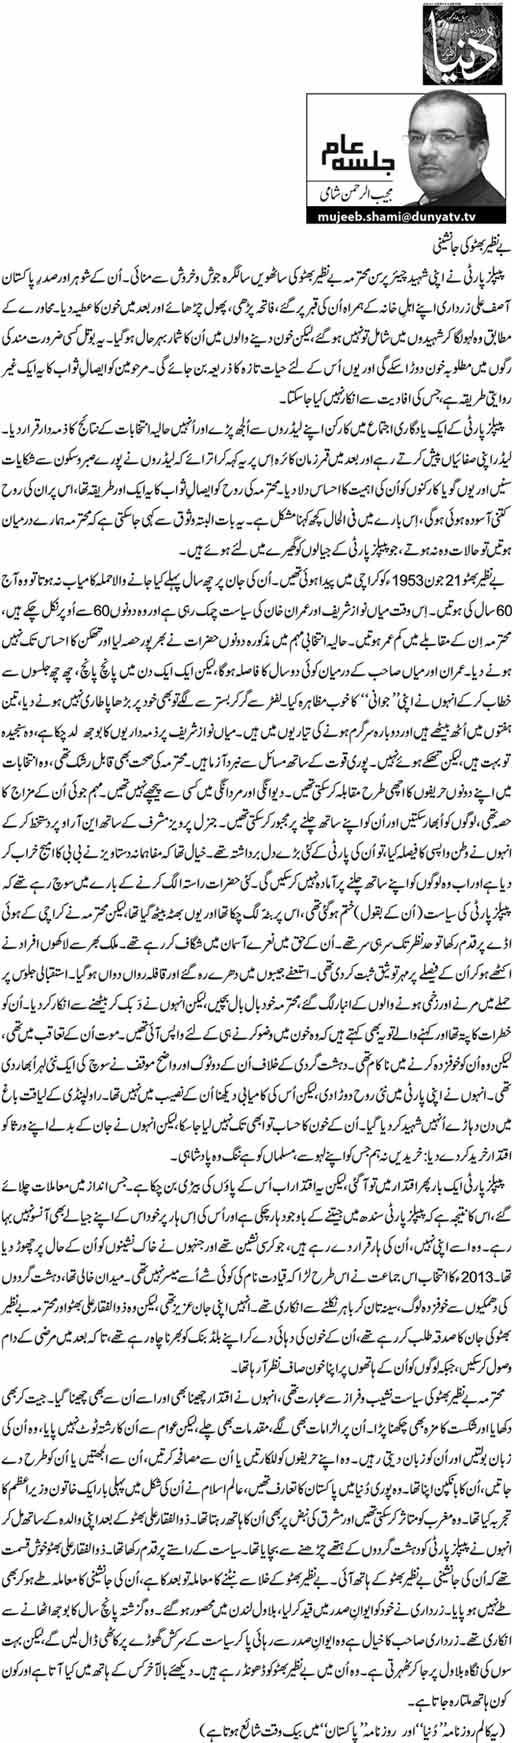 Benazir Bhutto Ki Janashini - Mujeeb ur Rehman Shami